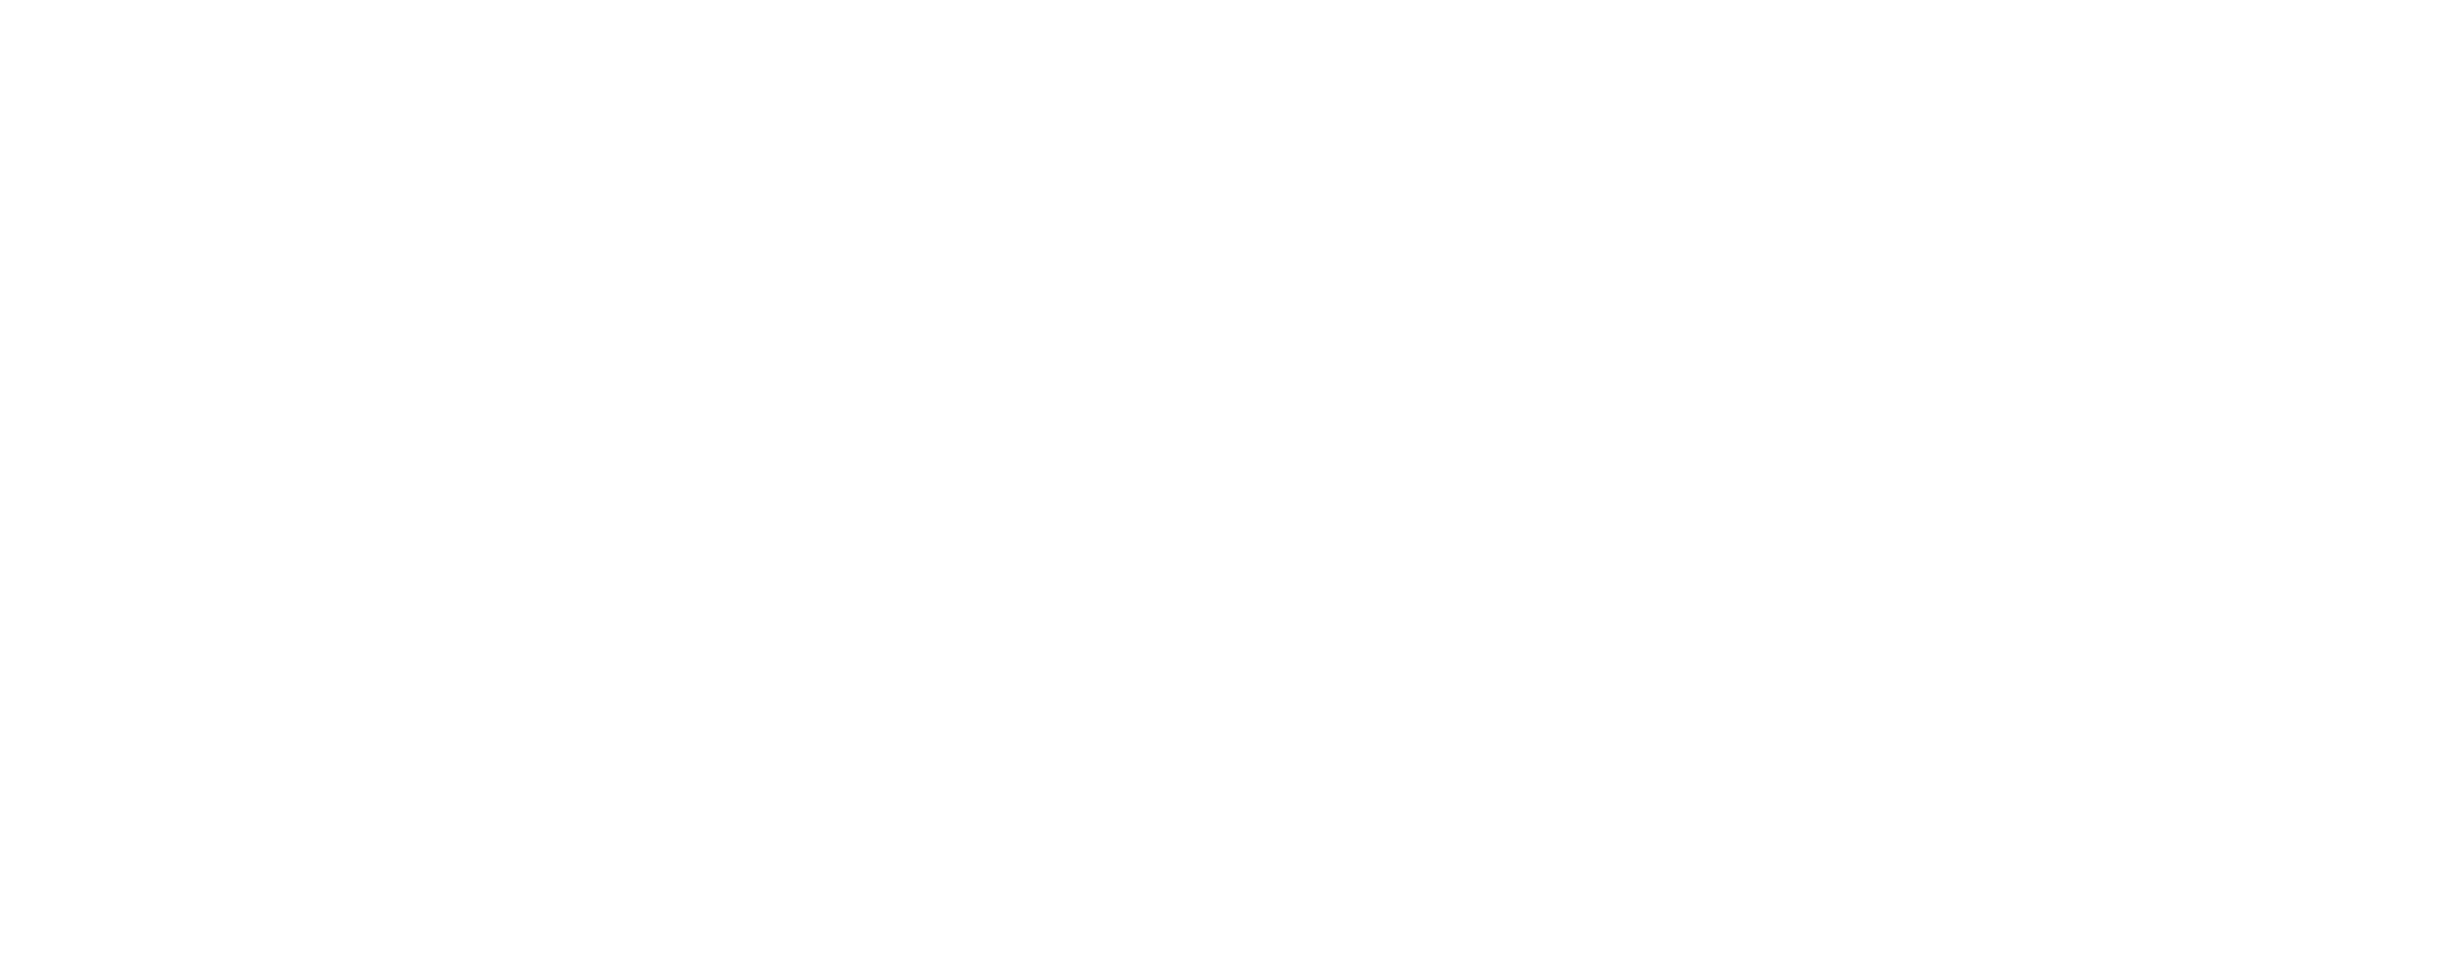 barrel33-reverse